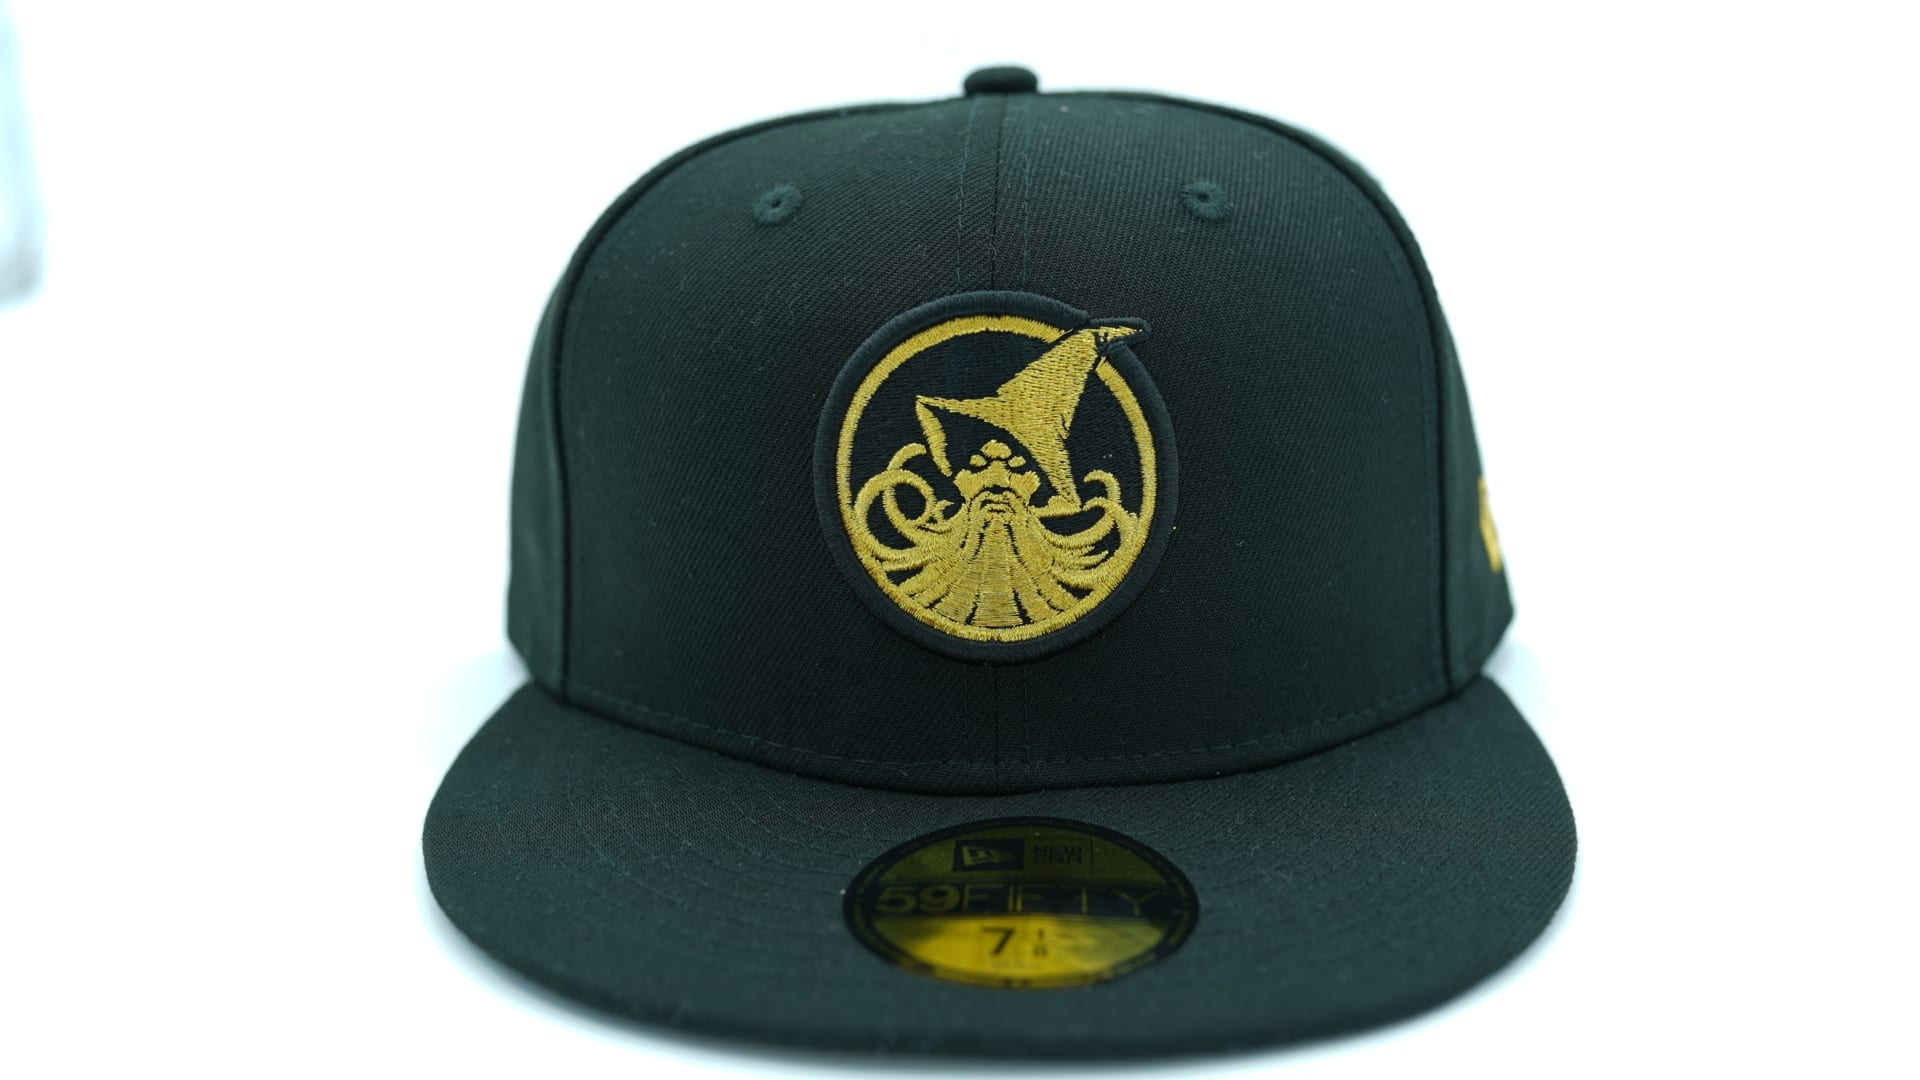 mitchell ness x nhl boston bruins fitted baseball hat